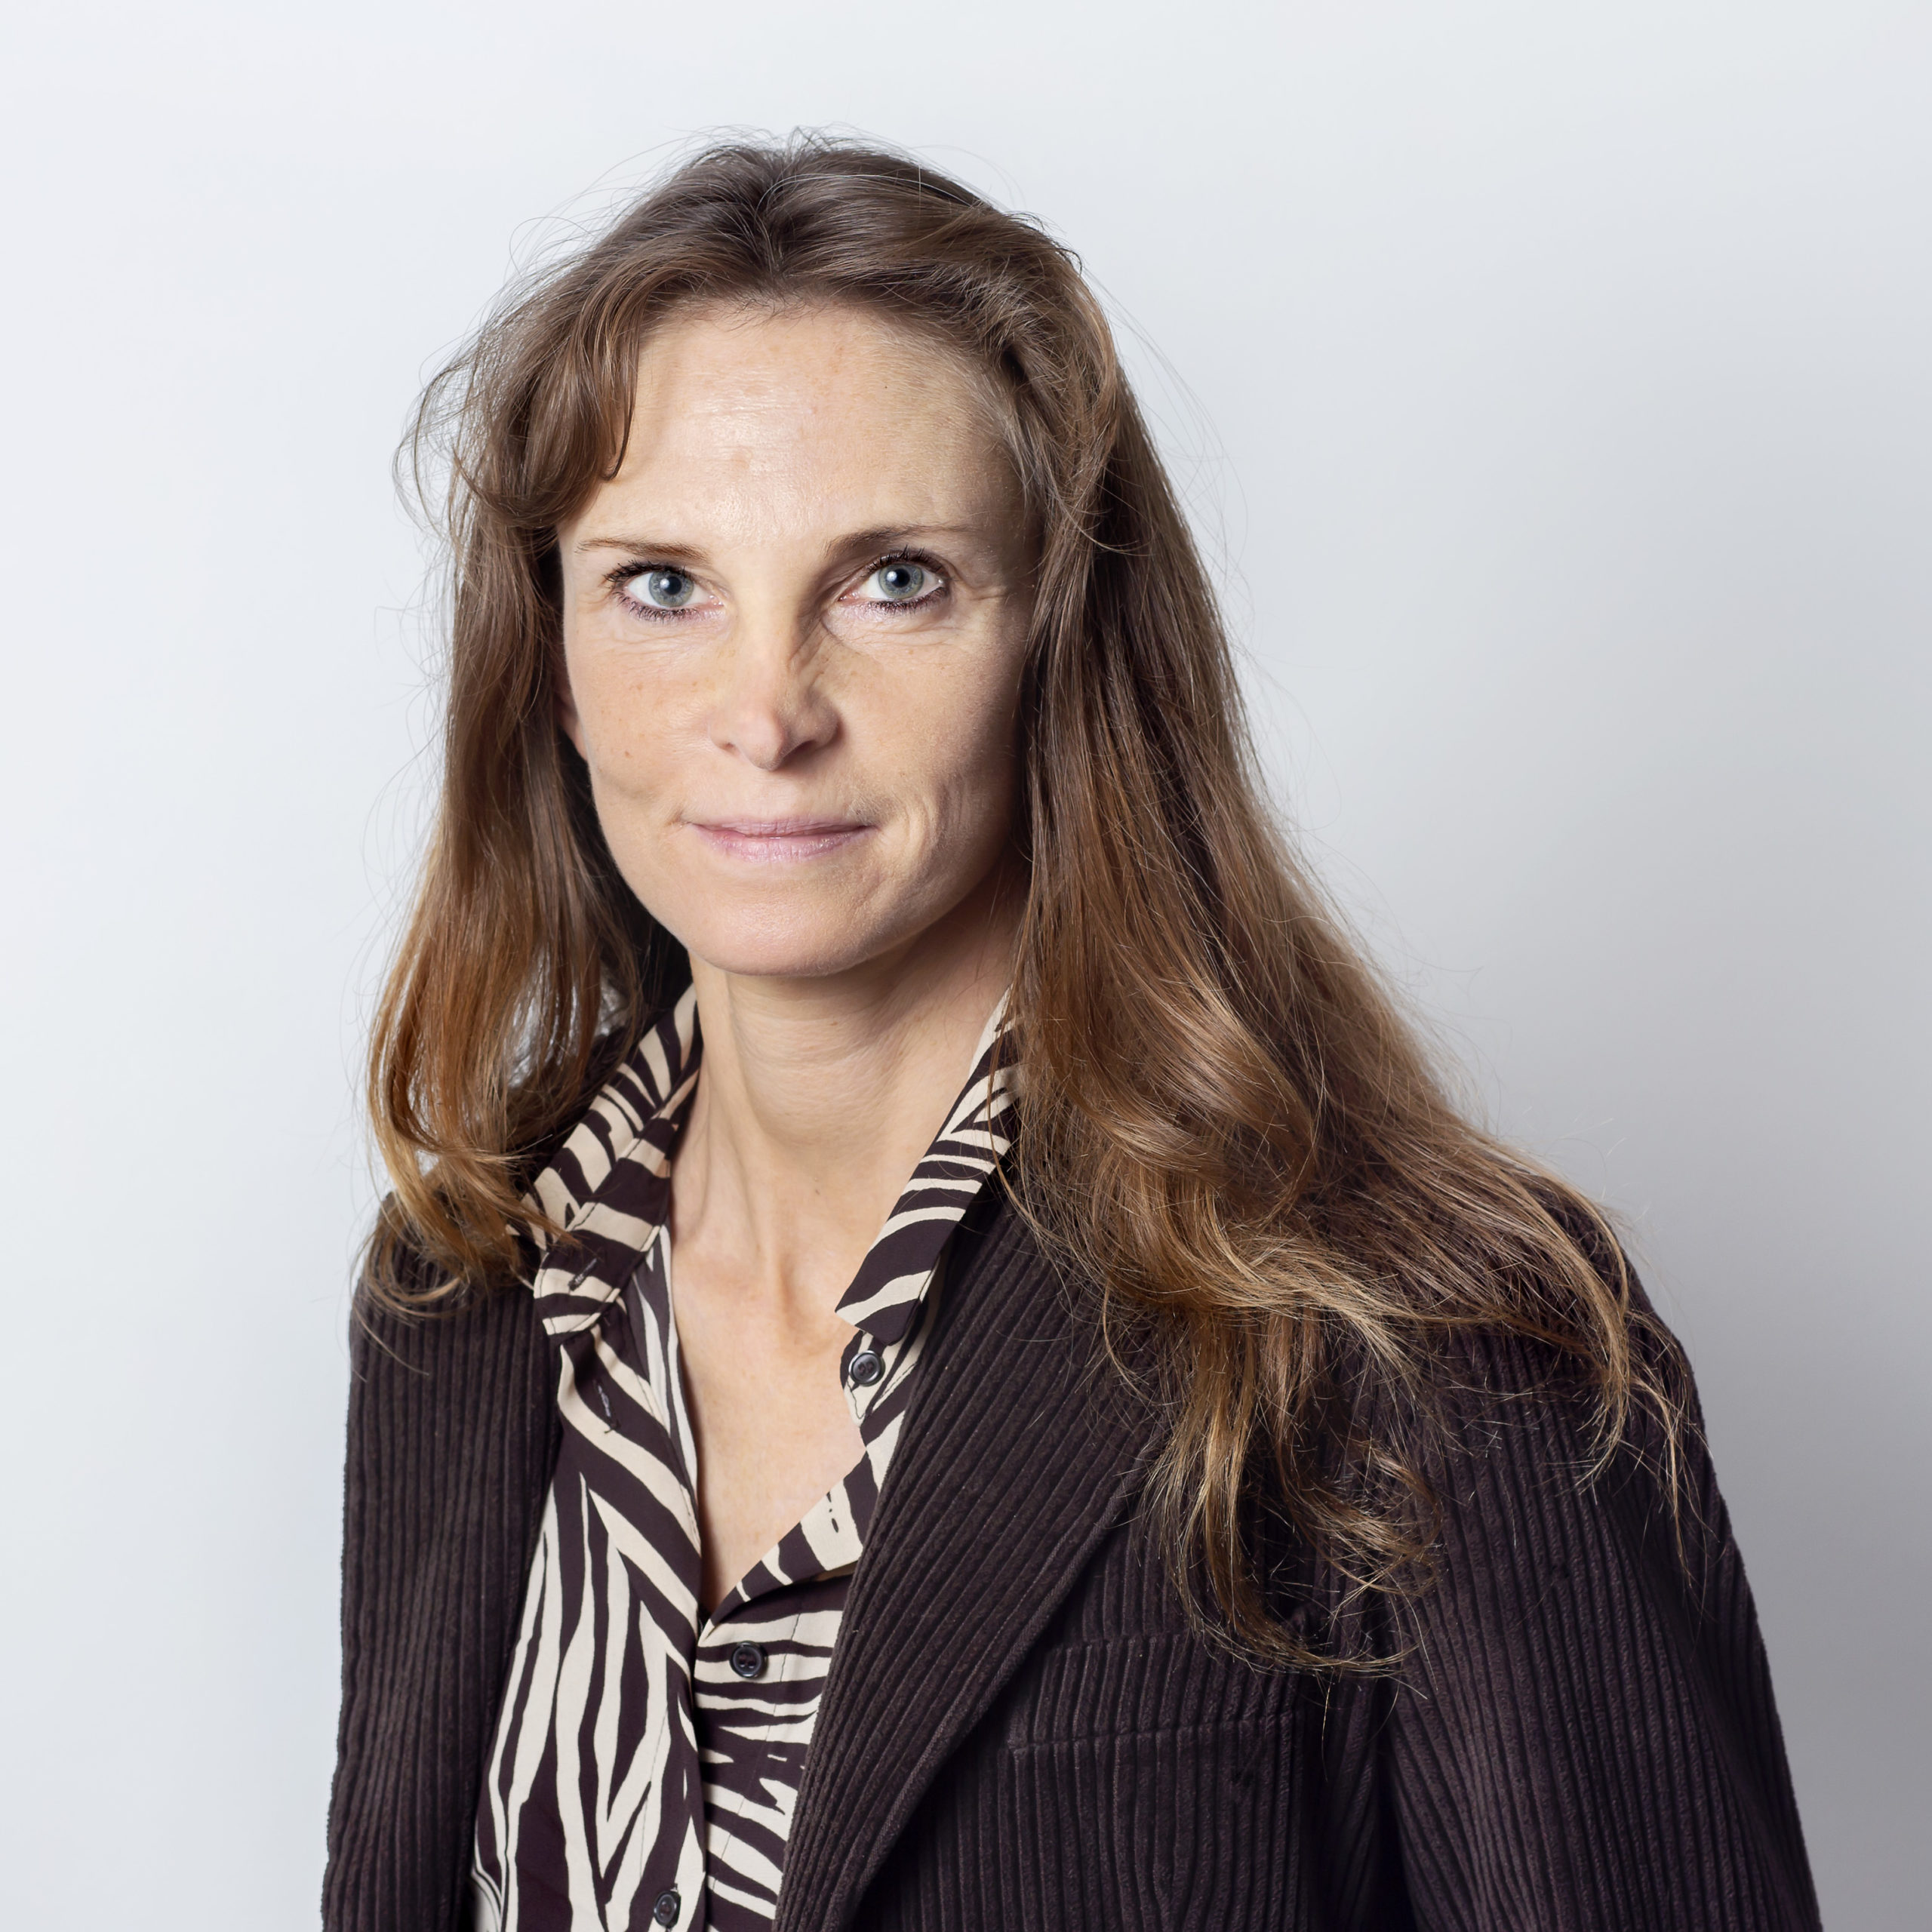 Catherine Zoller